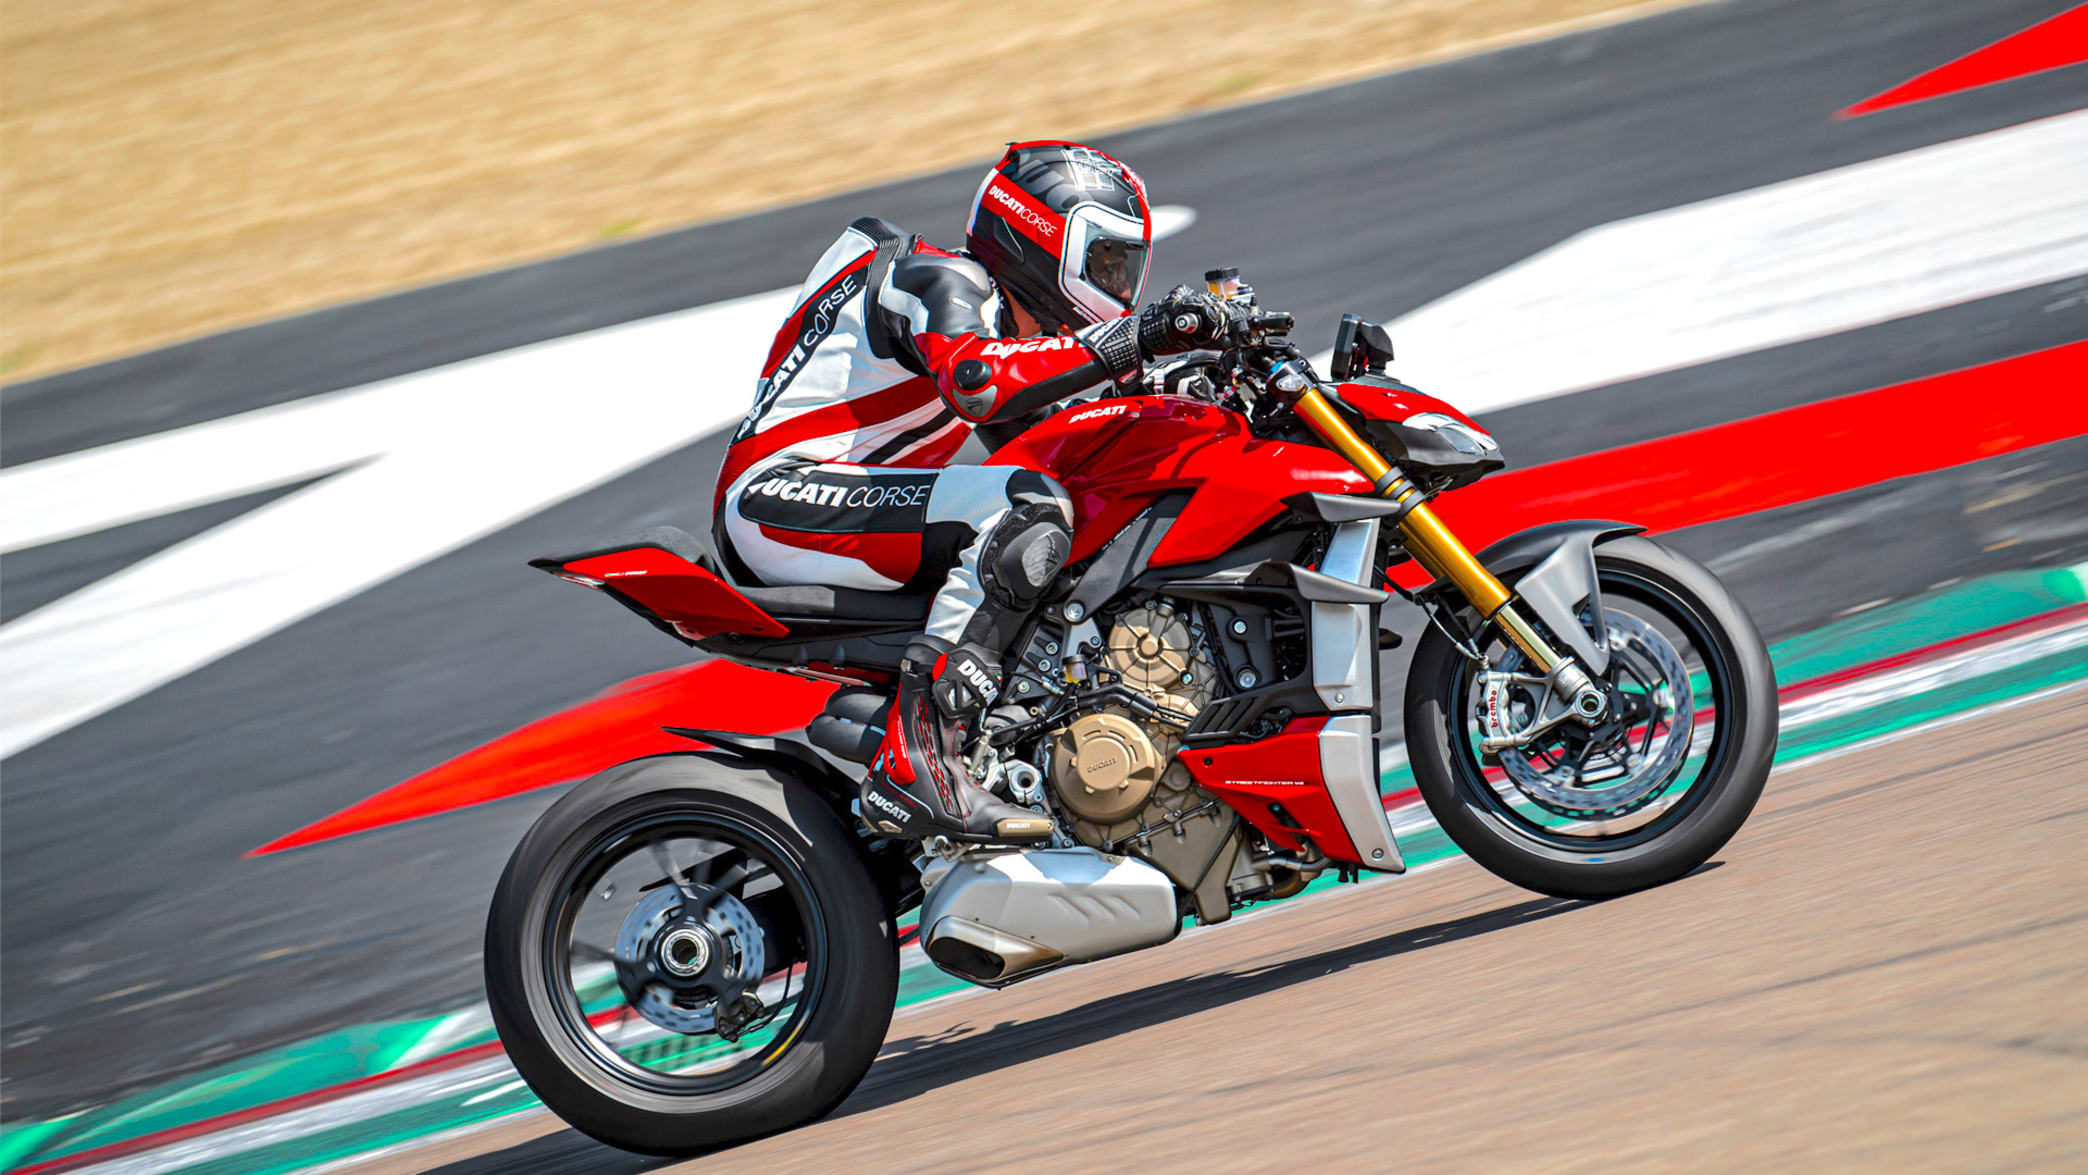 Rennfahrer fährt mit Ducati Streetfighter